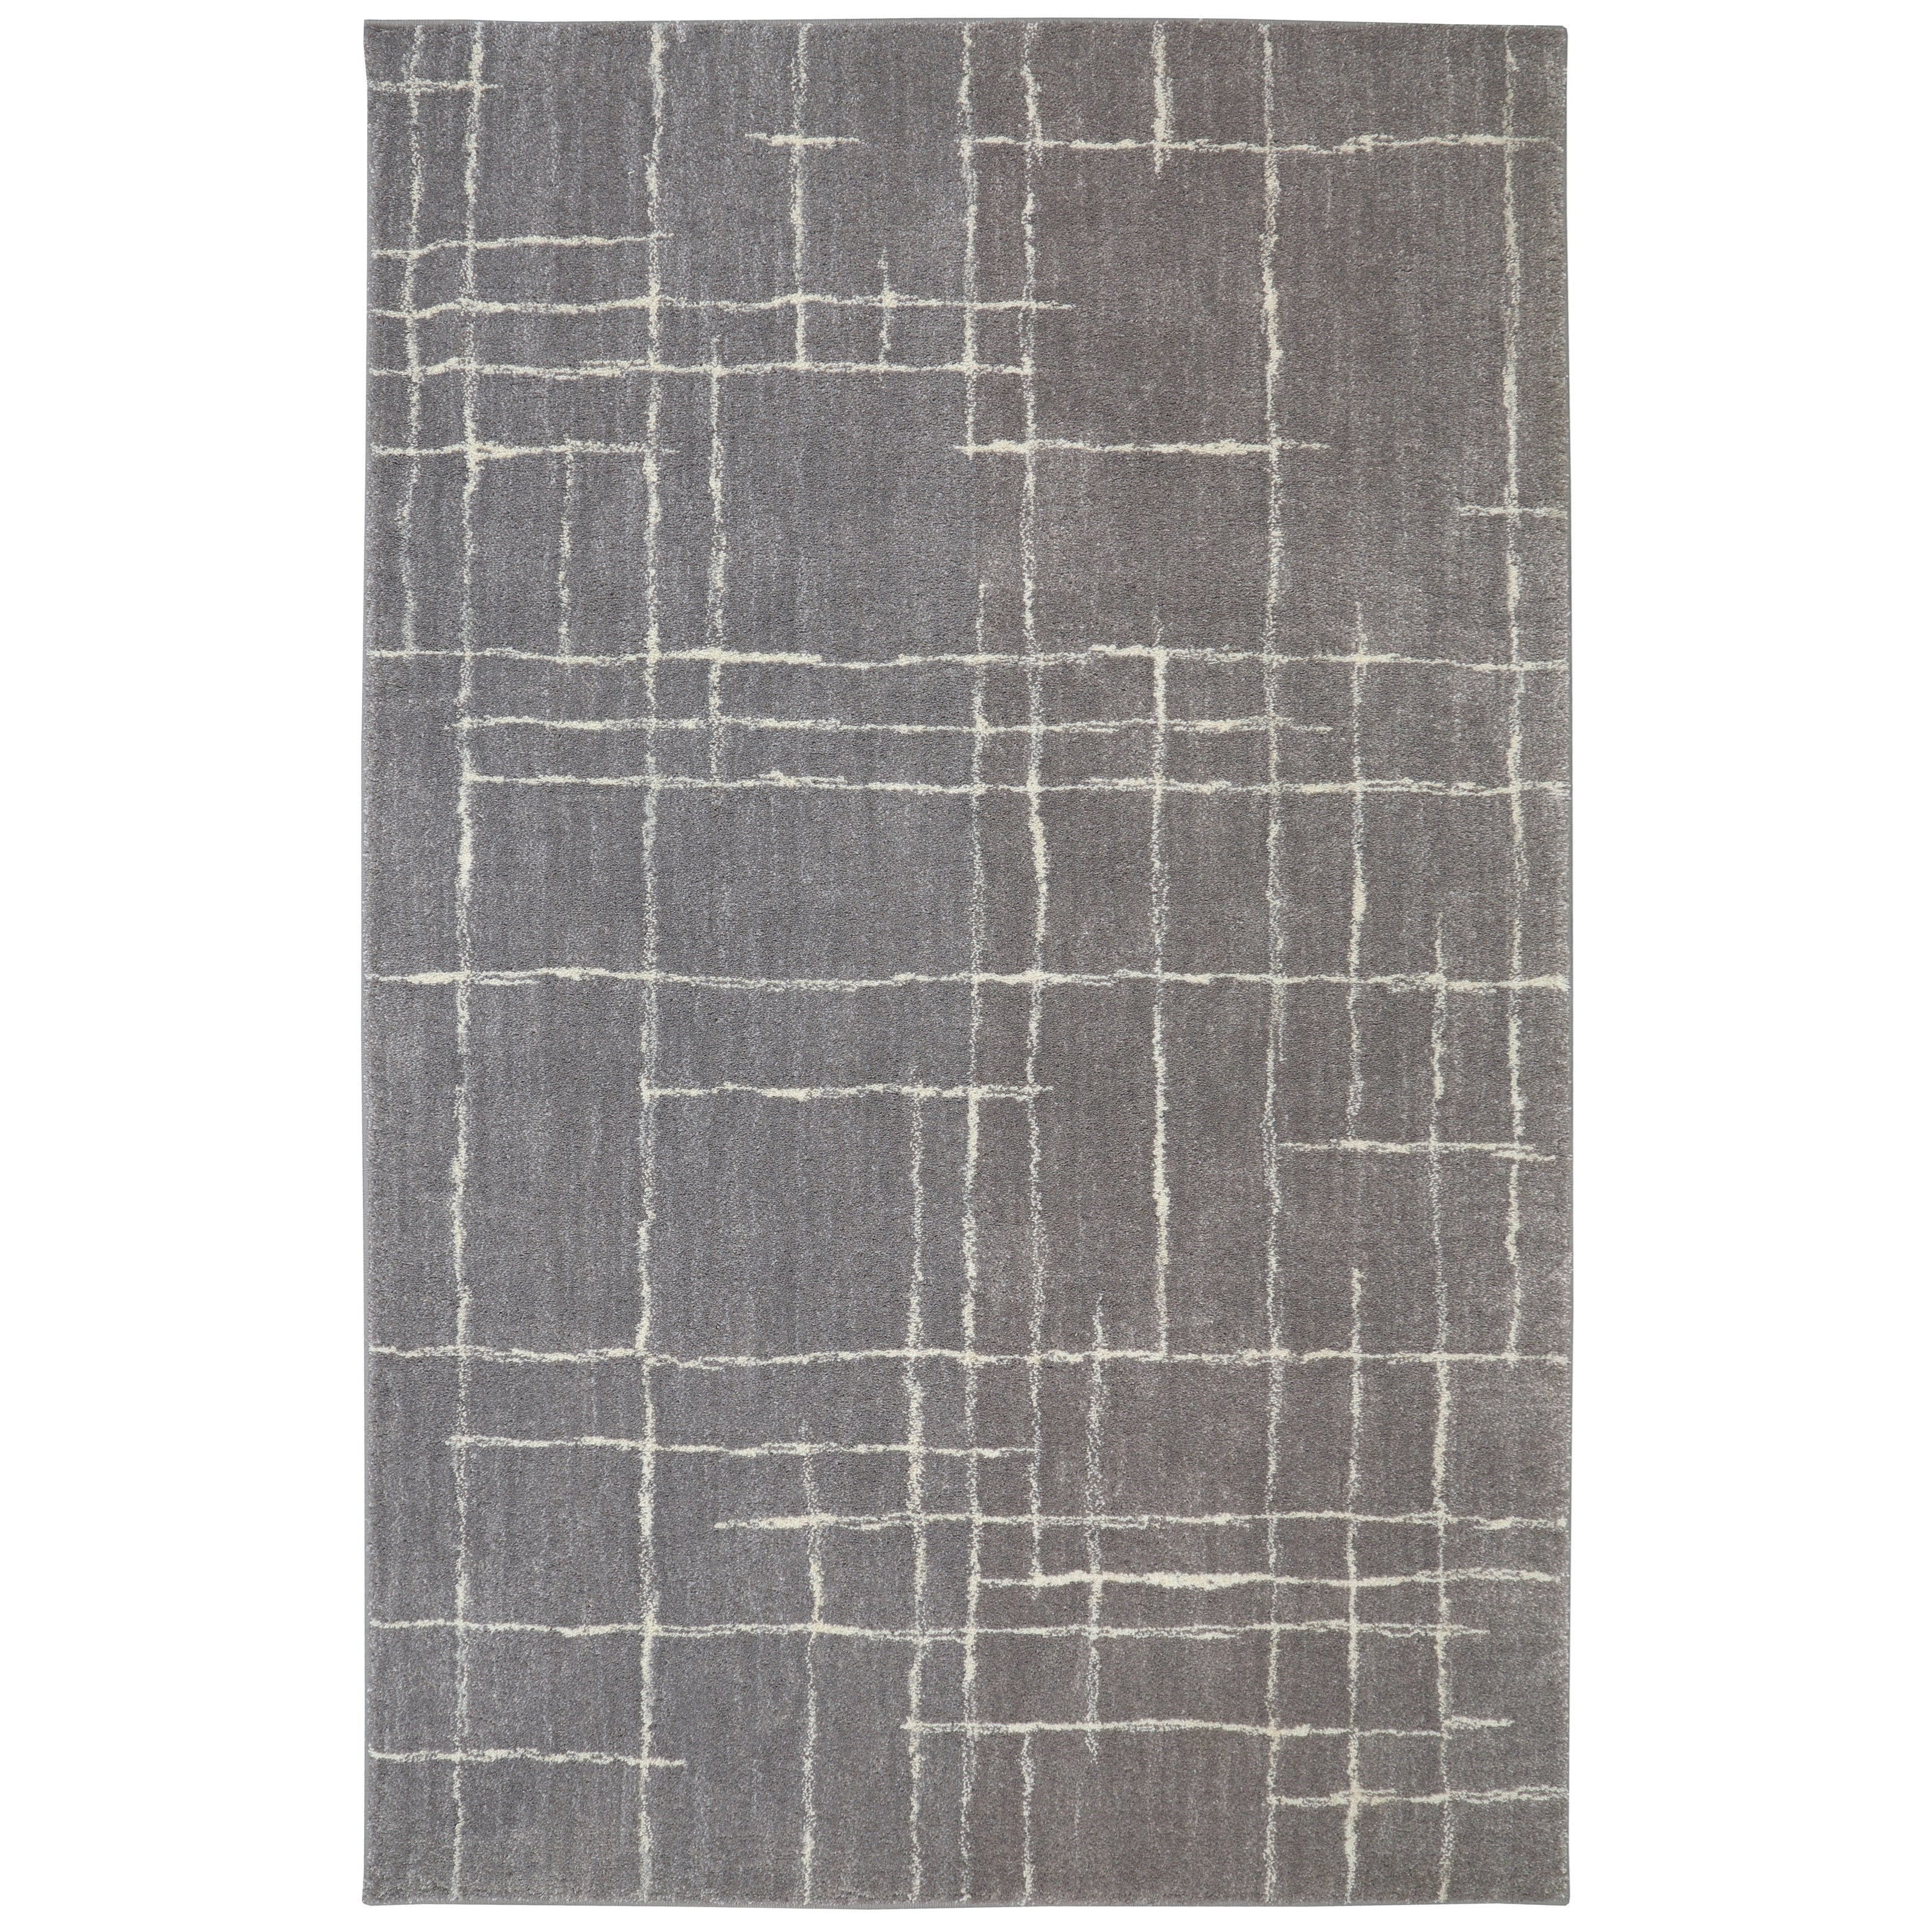 Berkshire 5'x8' Chatham Grey Area Rug by American Rug Craftsmen at Alison Craig Home Furnishings